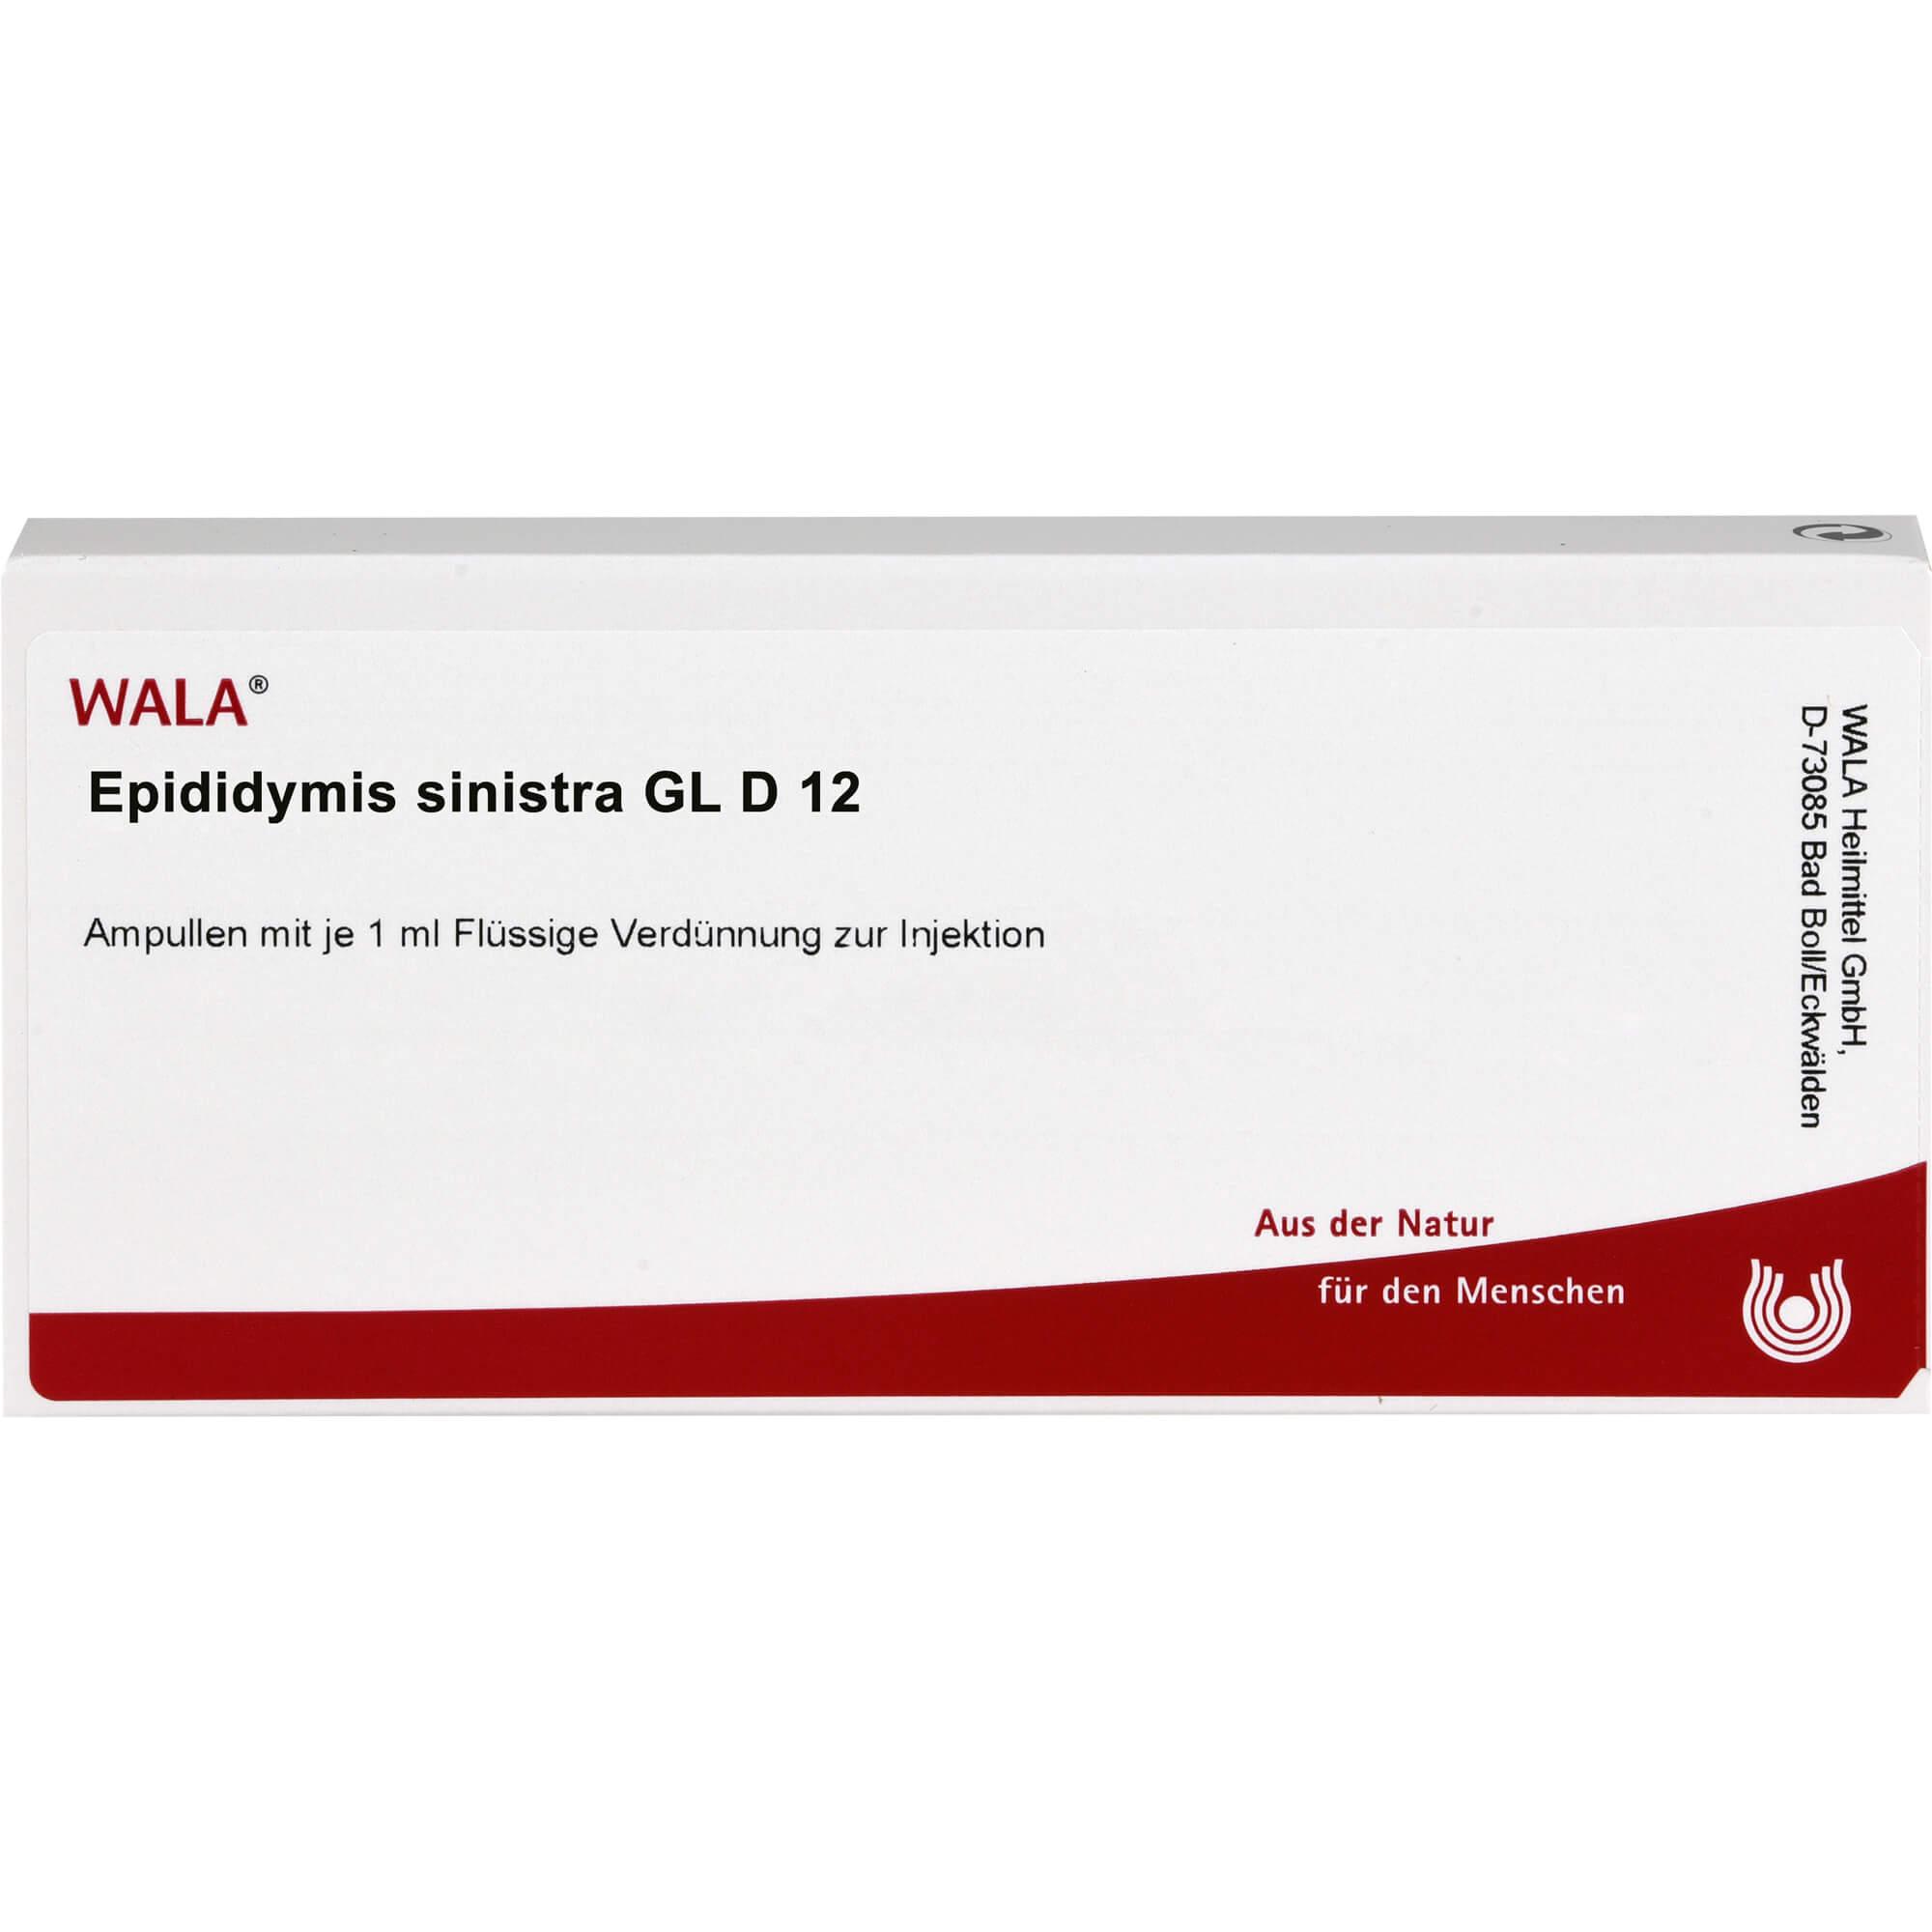 EPIDIDYMIS-sinistra-GL-D-12-Ampullen